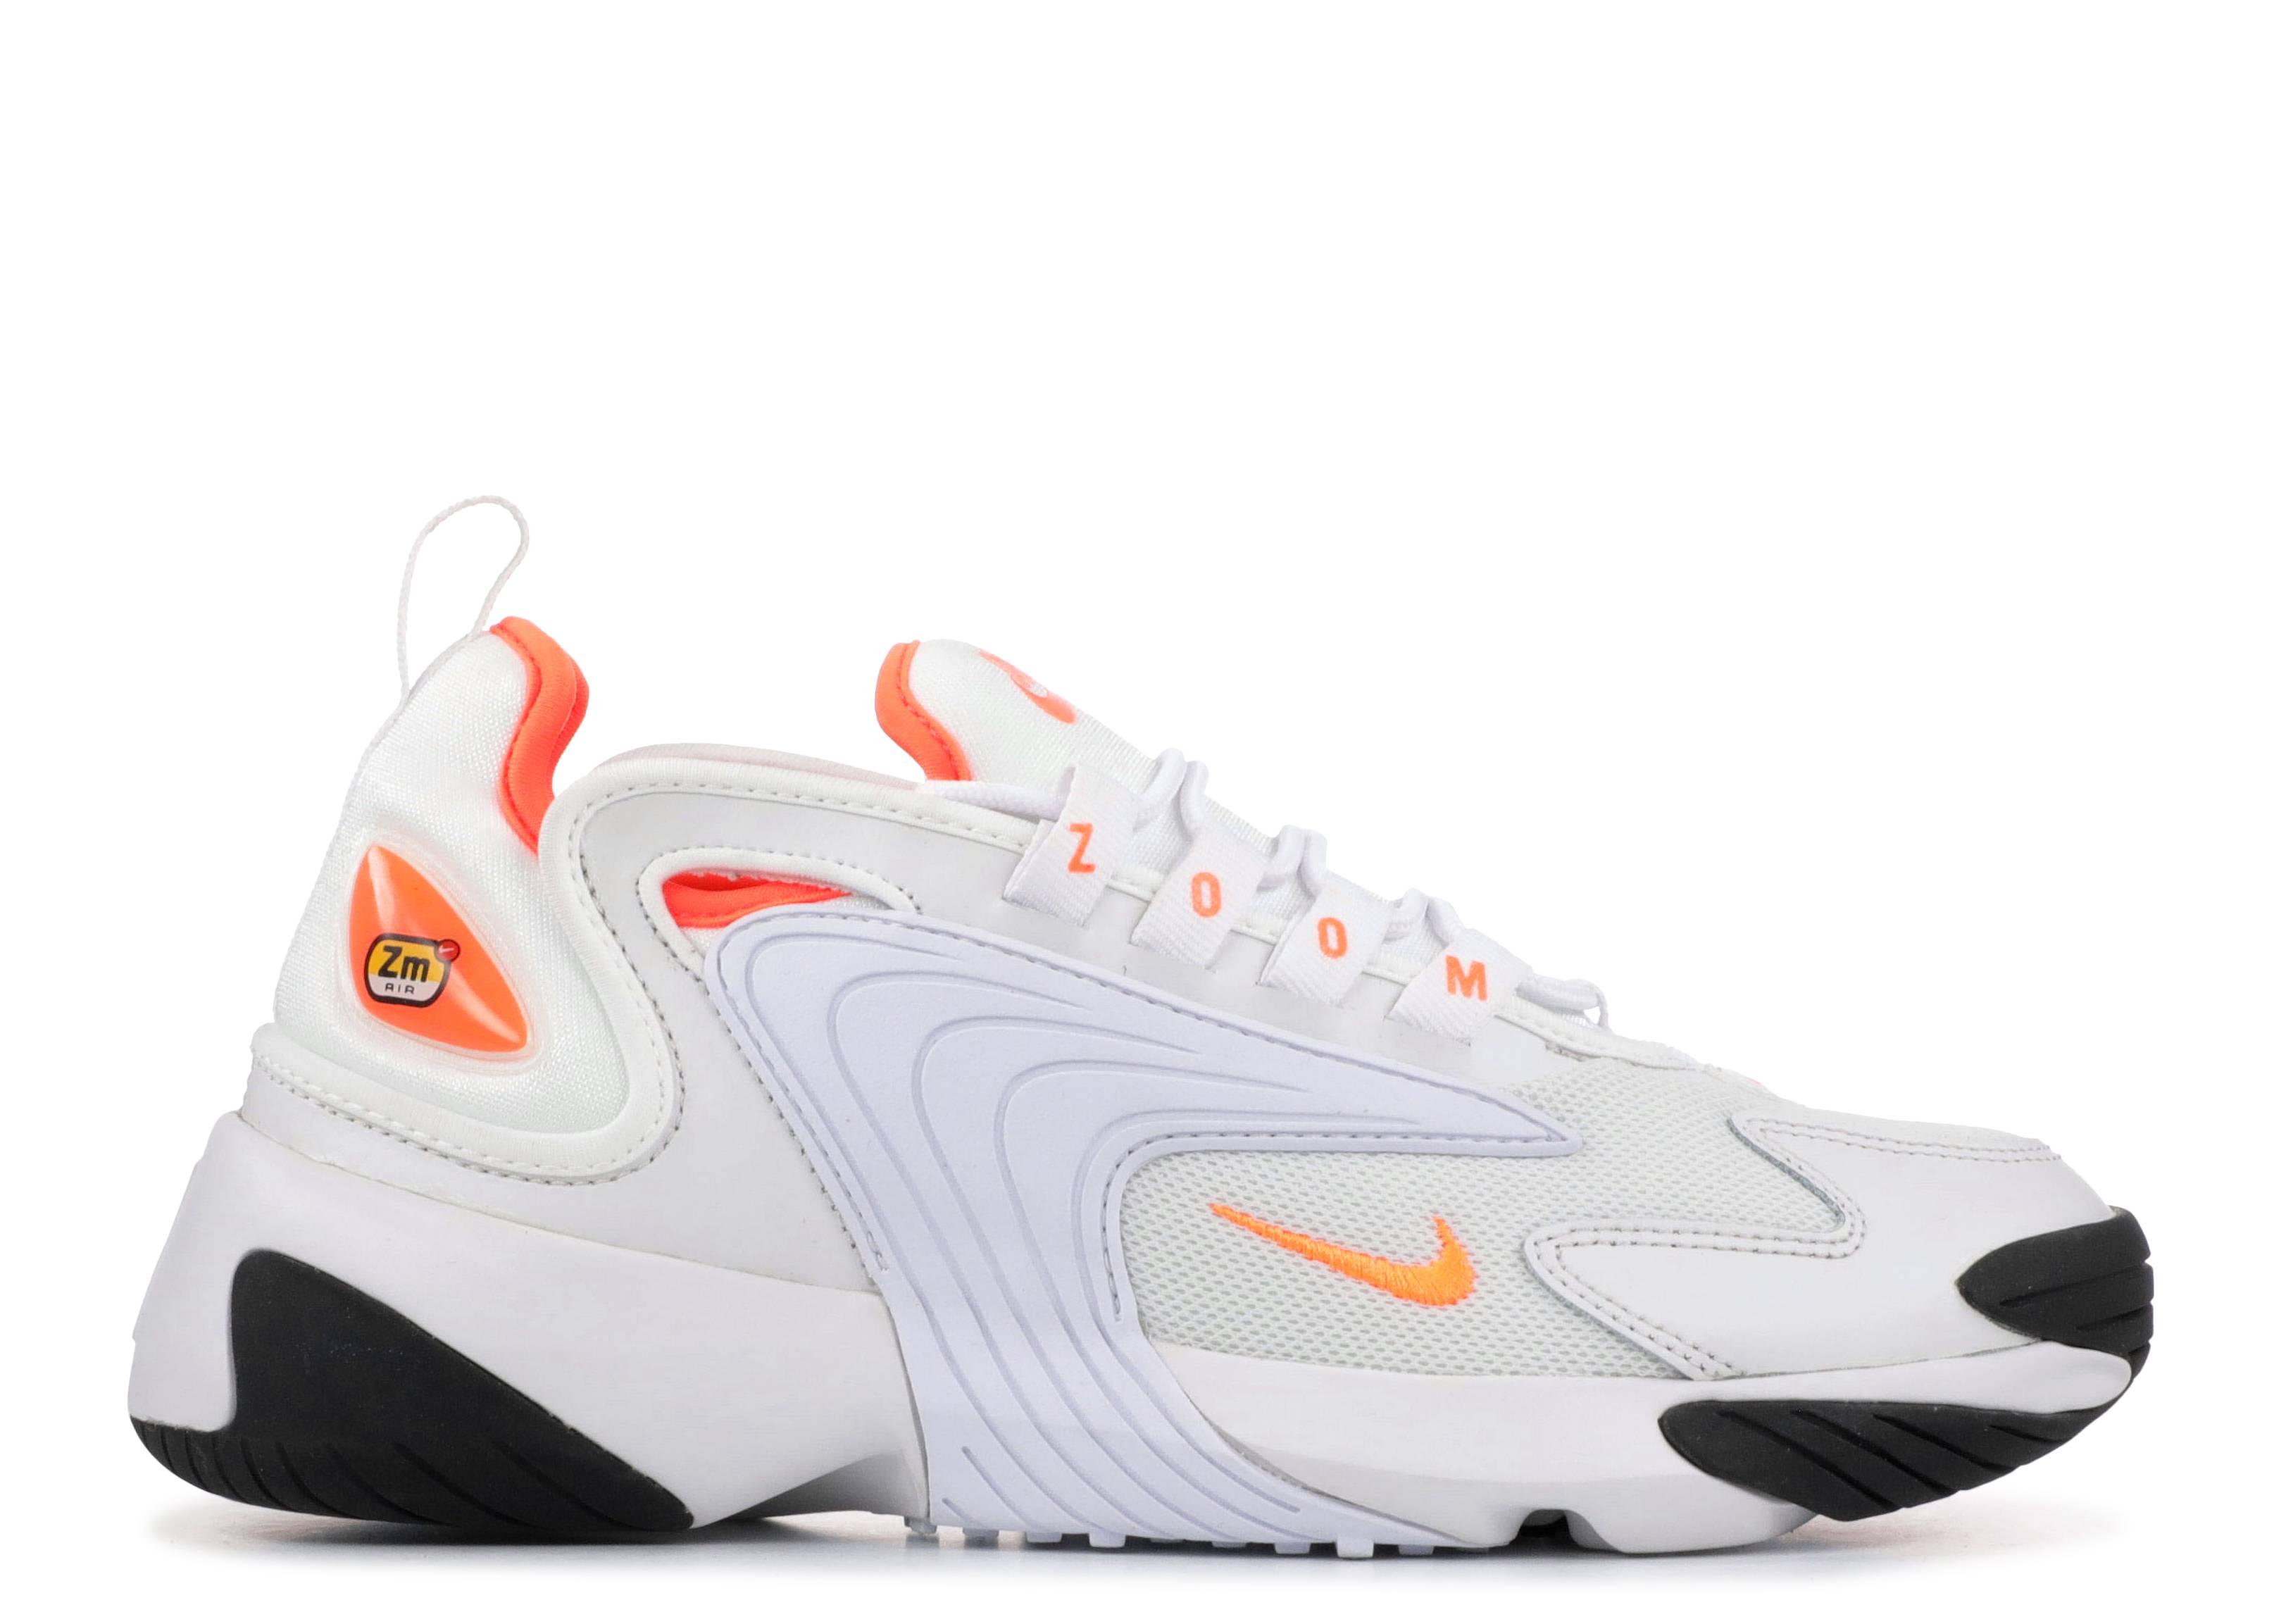 967ebcc1cb64 Nike Zoom 2k - Nike - ao0354 002 - white safety orange- black ...